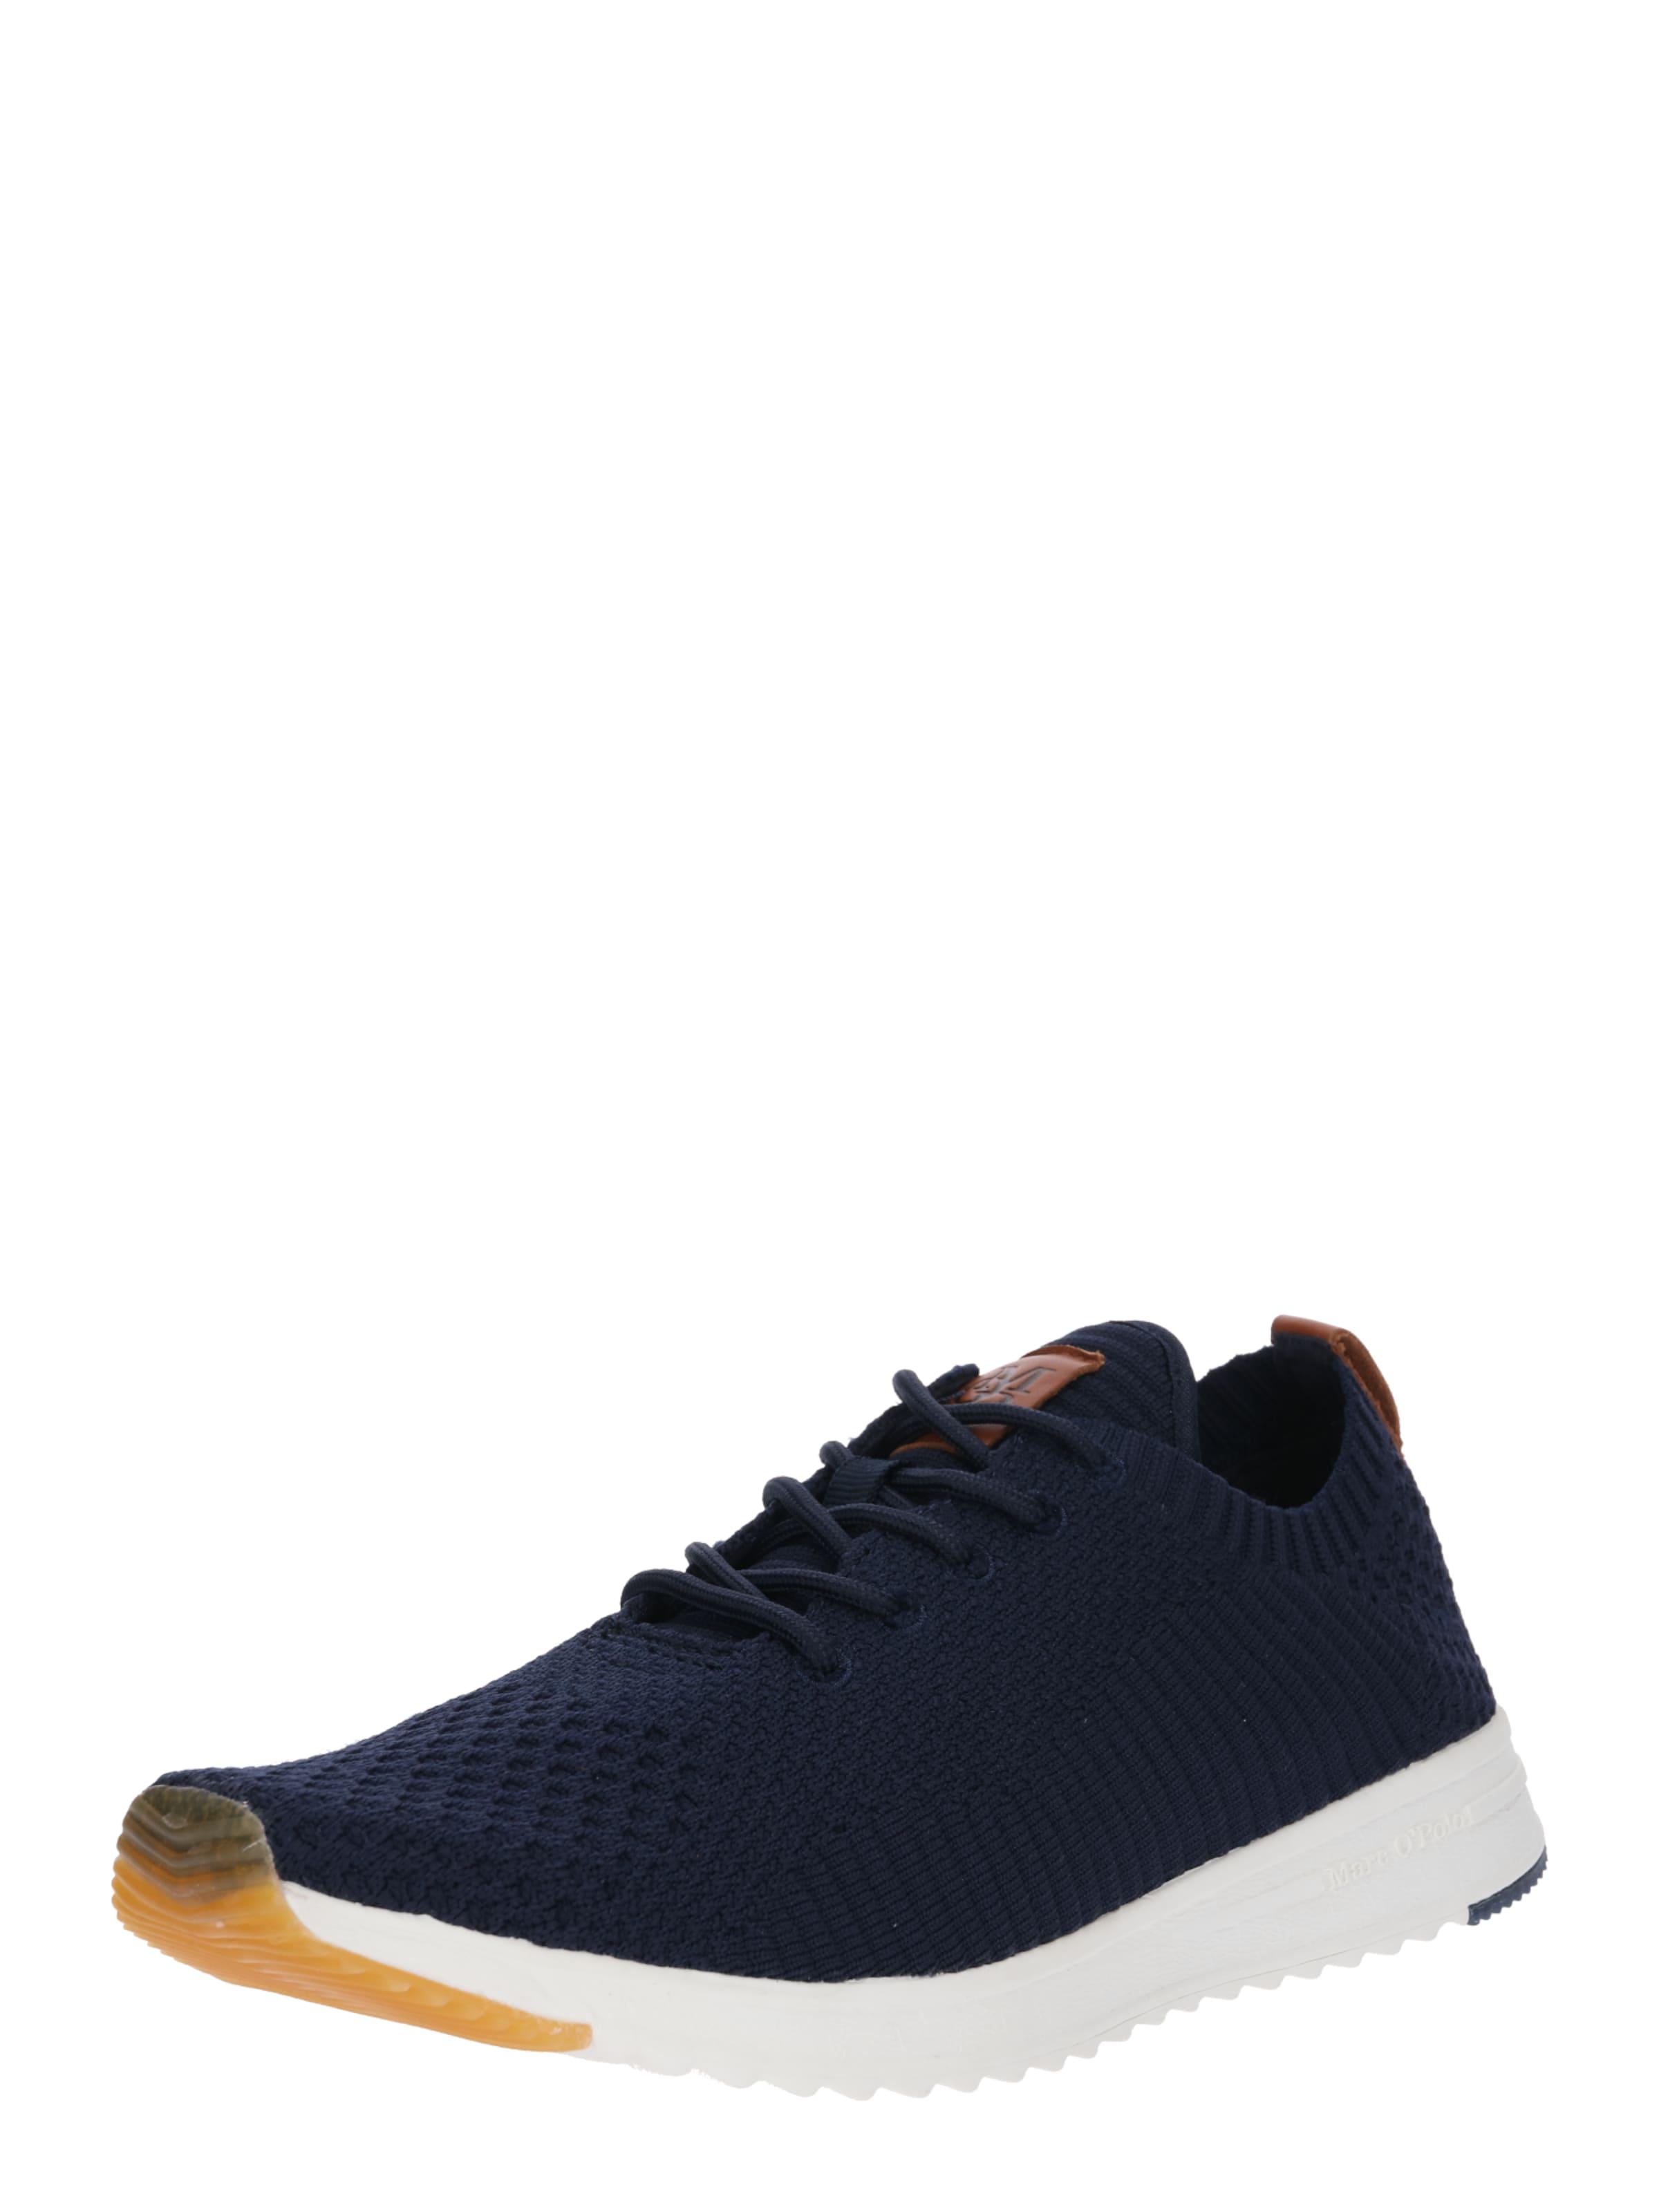 Sneaker Marc In O'polo Navy ARL35cq4j